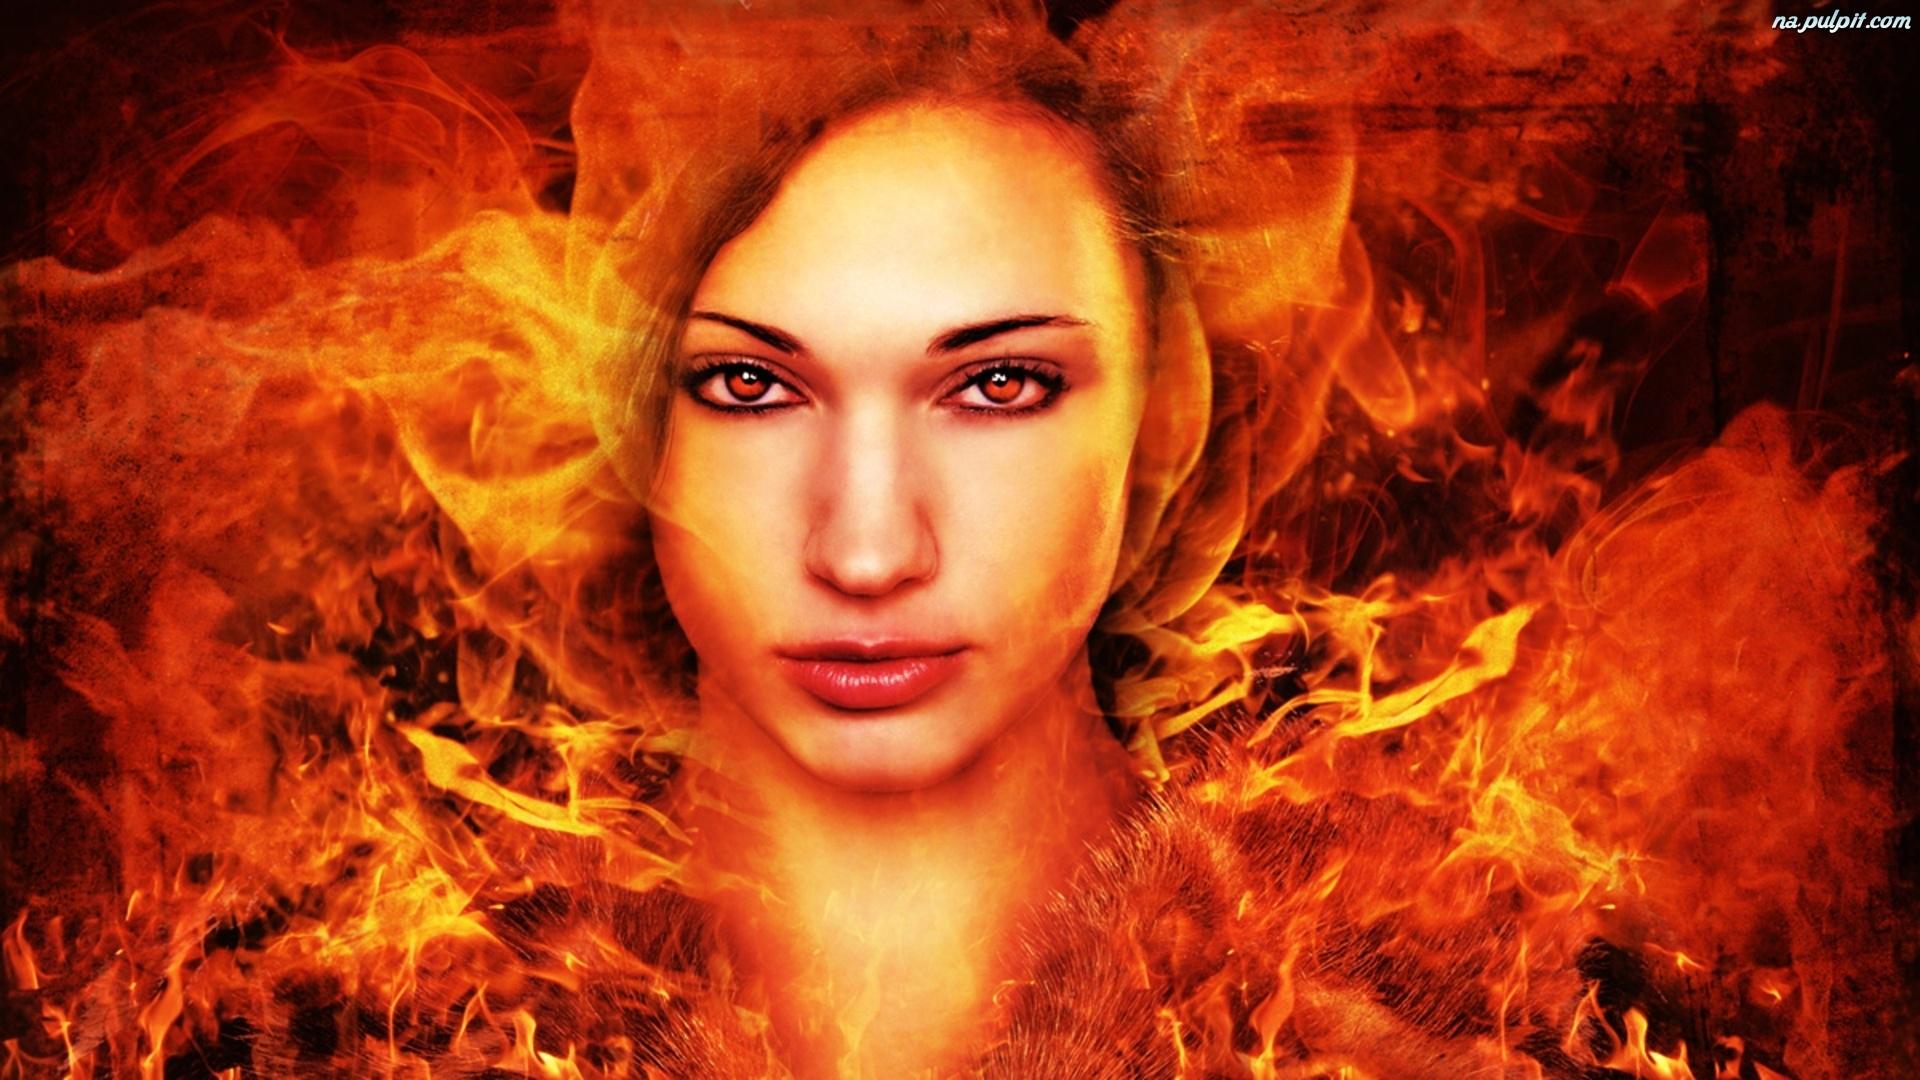 Fantasy Fallen Angels Girls Wallpaper Ogień Twarz Kobiety Na Pulpit